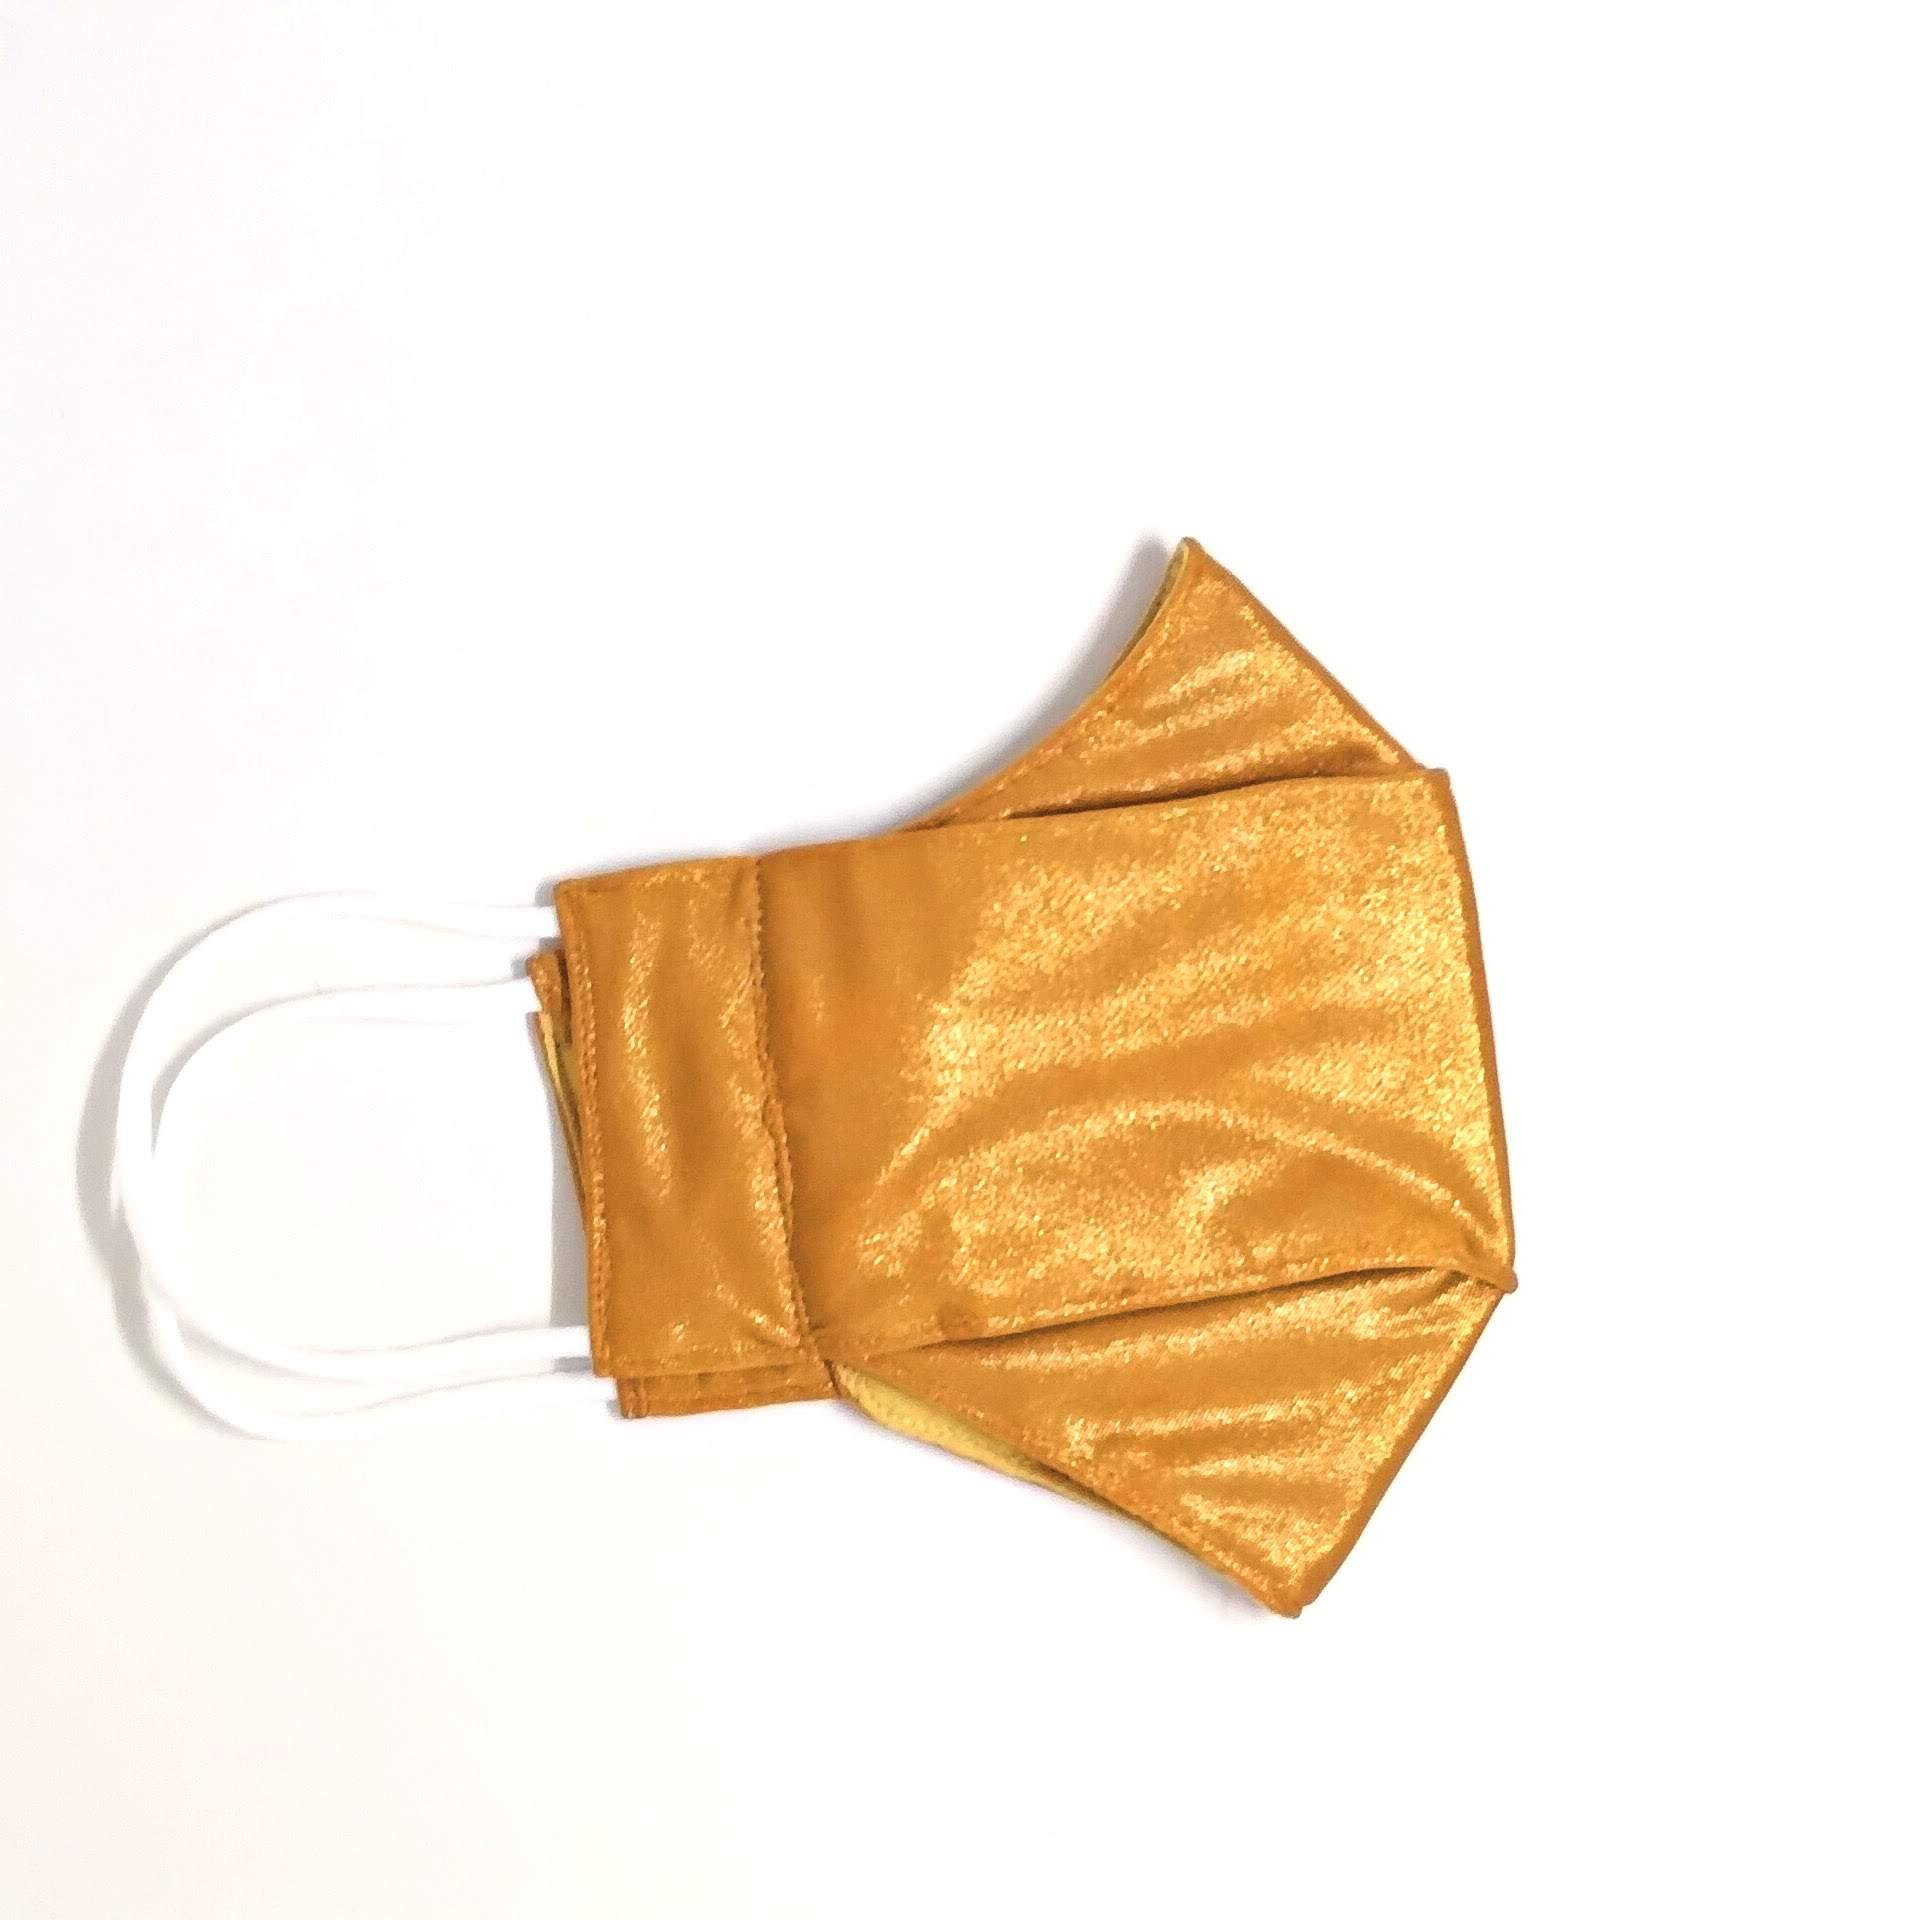 Máscara 3D Cirré Dourada Brilhosa Luxo Fashion Lavável